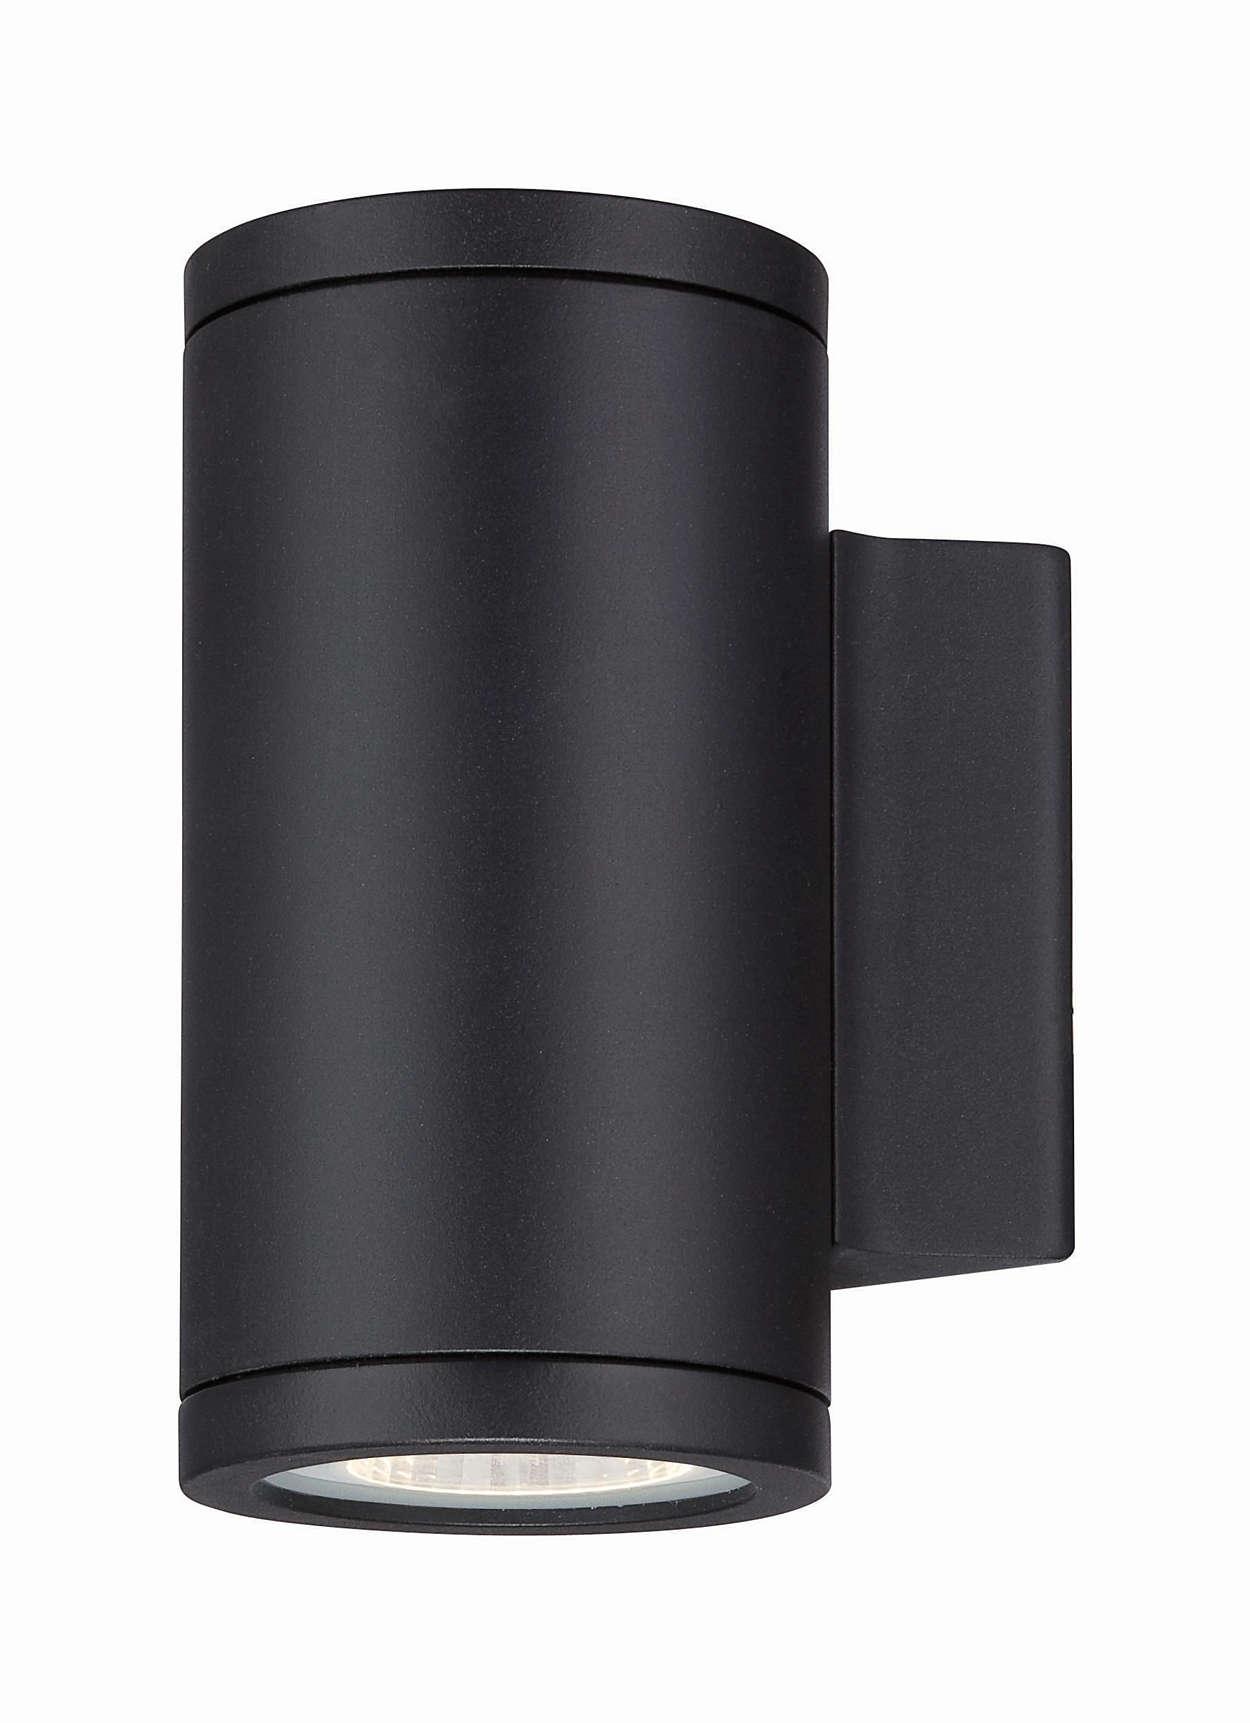 Wall Led Bulbs : Wall light FL0008030 Forecast